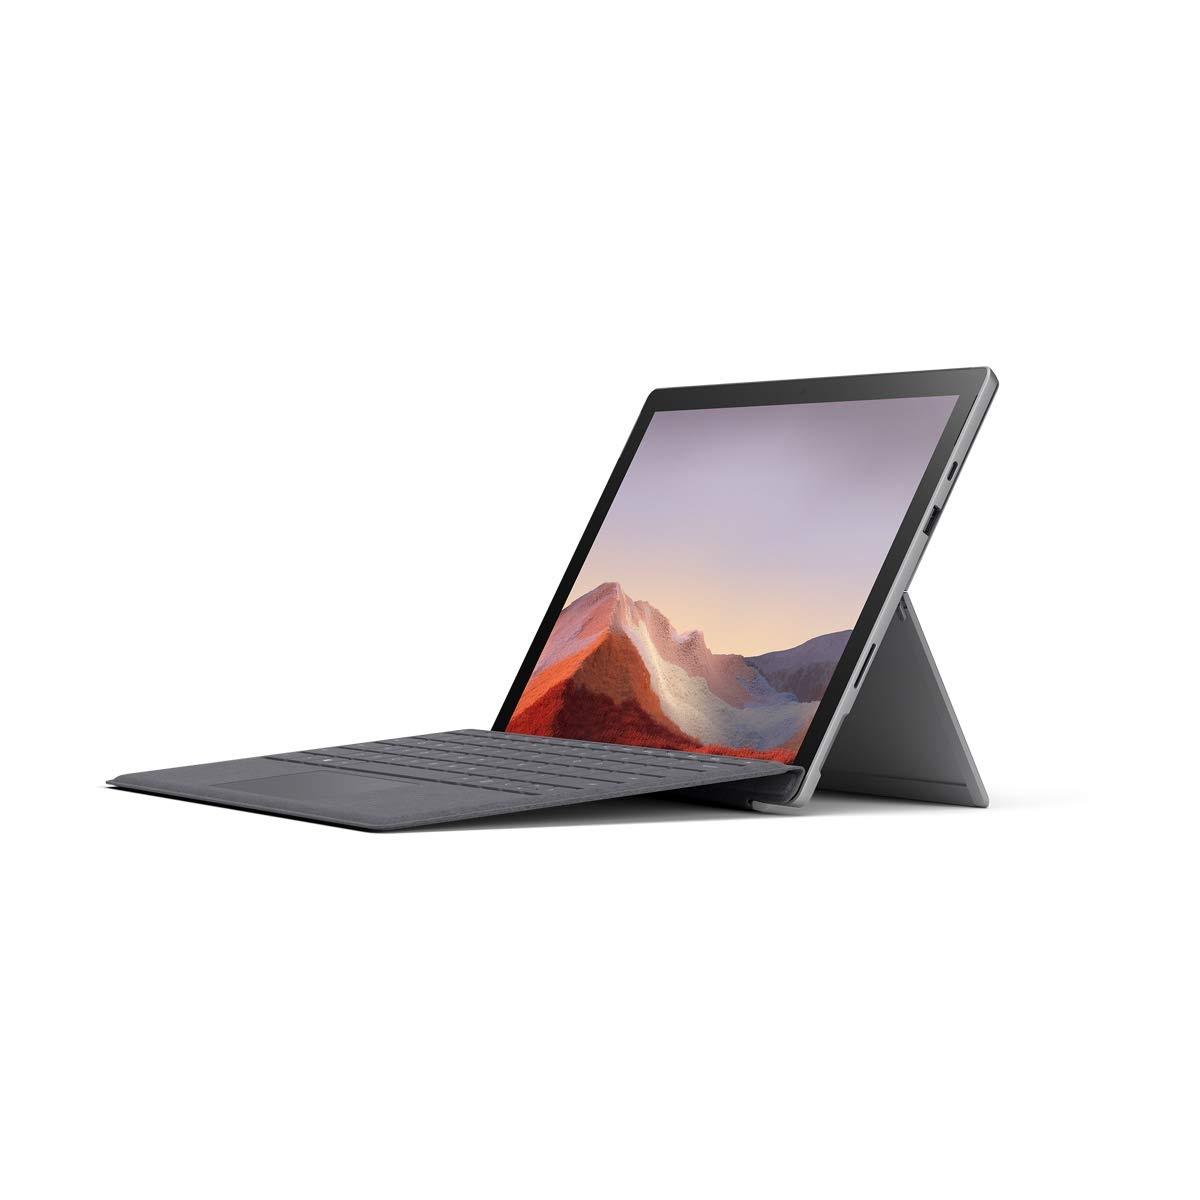 Microsoft Surface Pro 7 VDH-00013 12.3 inch laptop